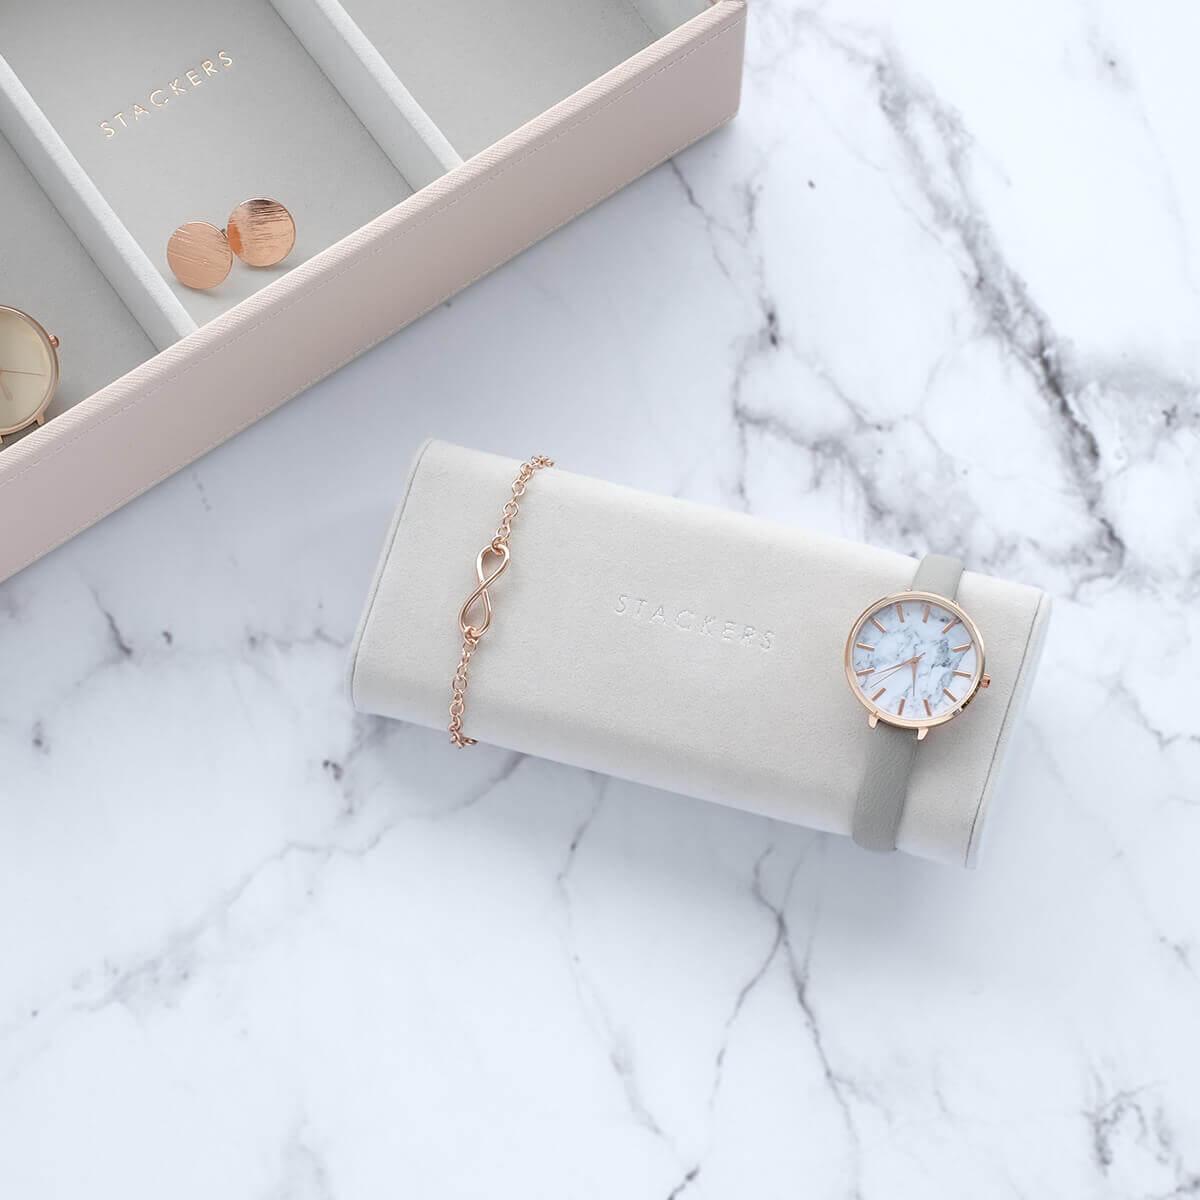 poduszki na zegarki i bransoletki